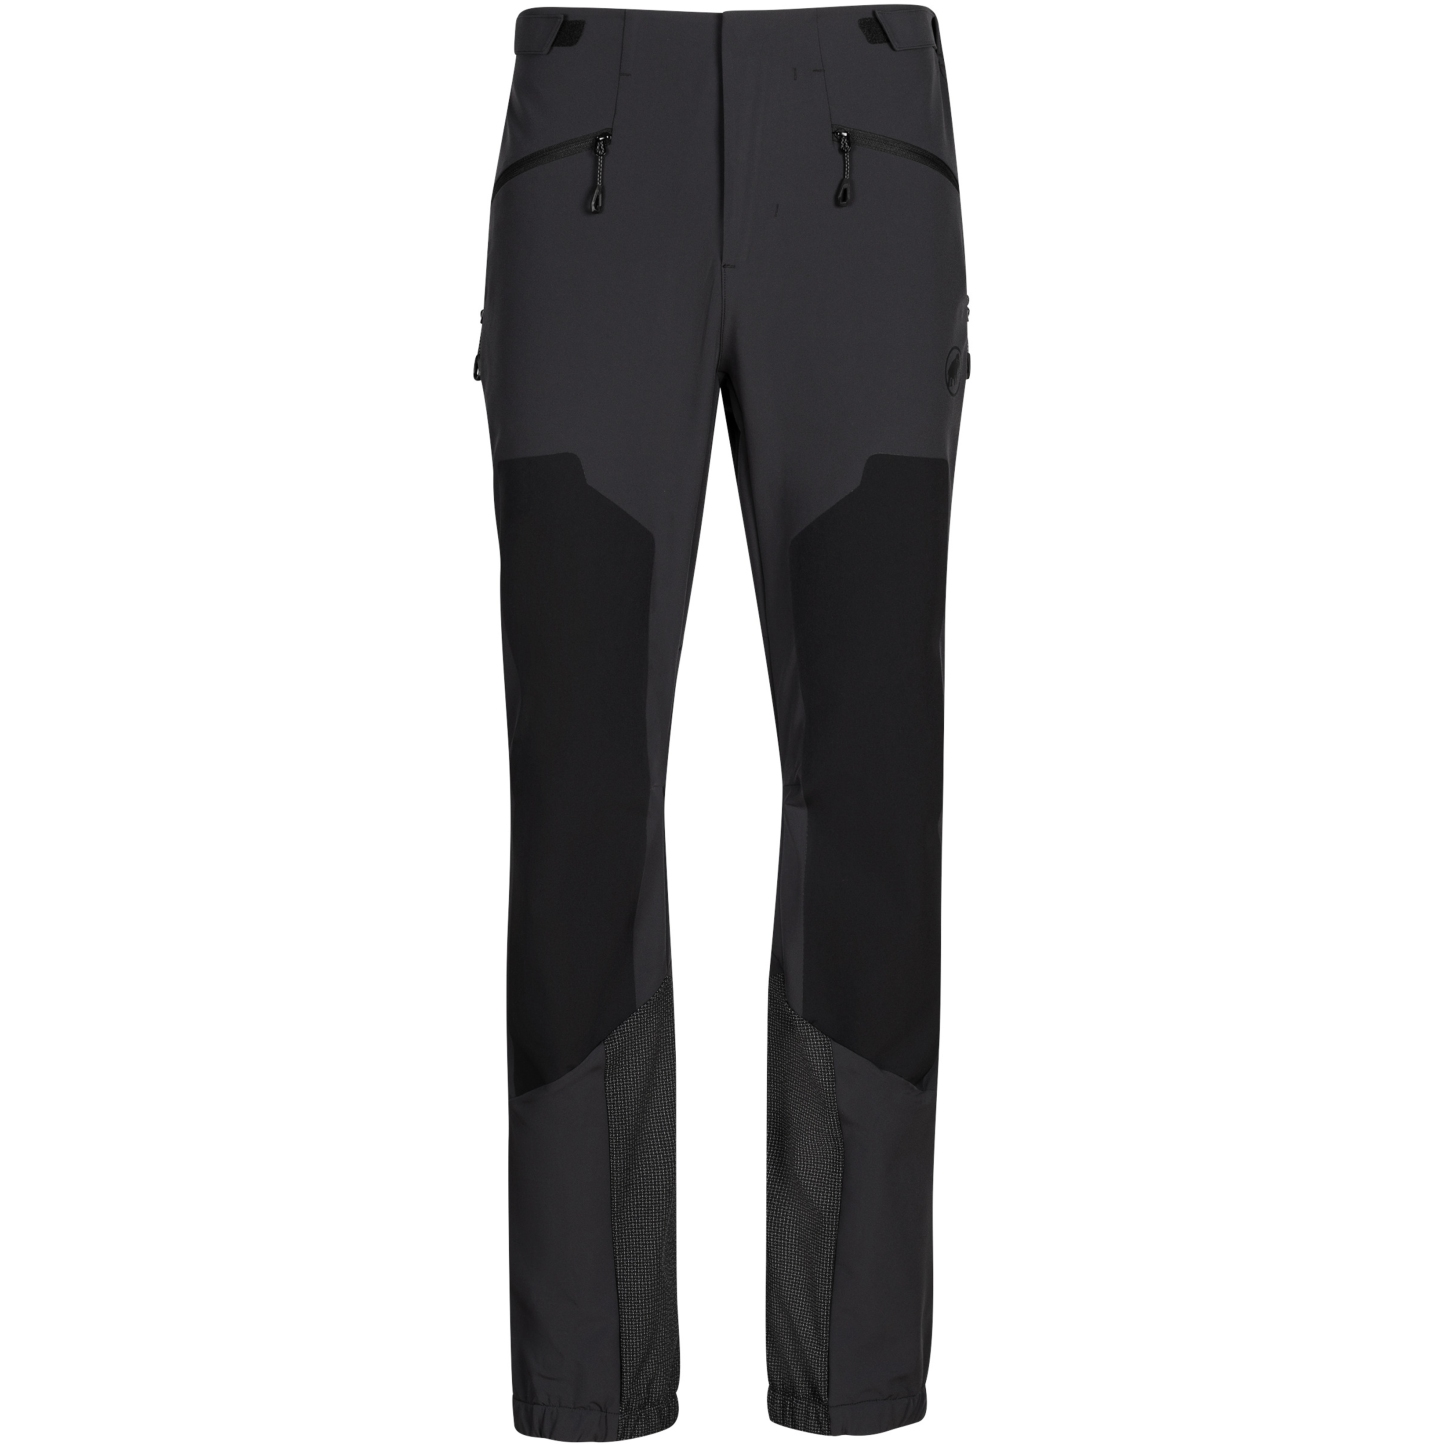 Mammut Aenergy Pro Pantalones Softshell para Hombres - black-black - regular